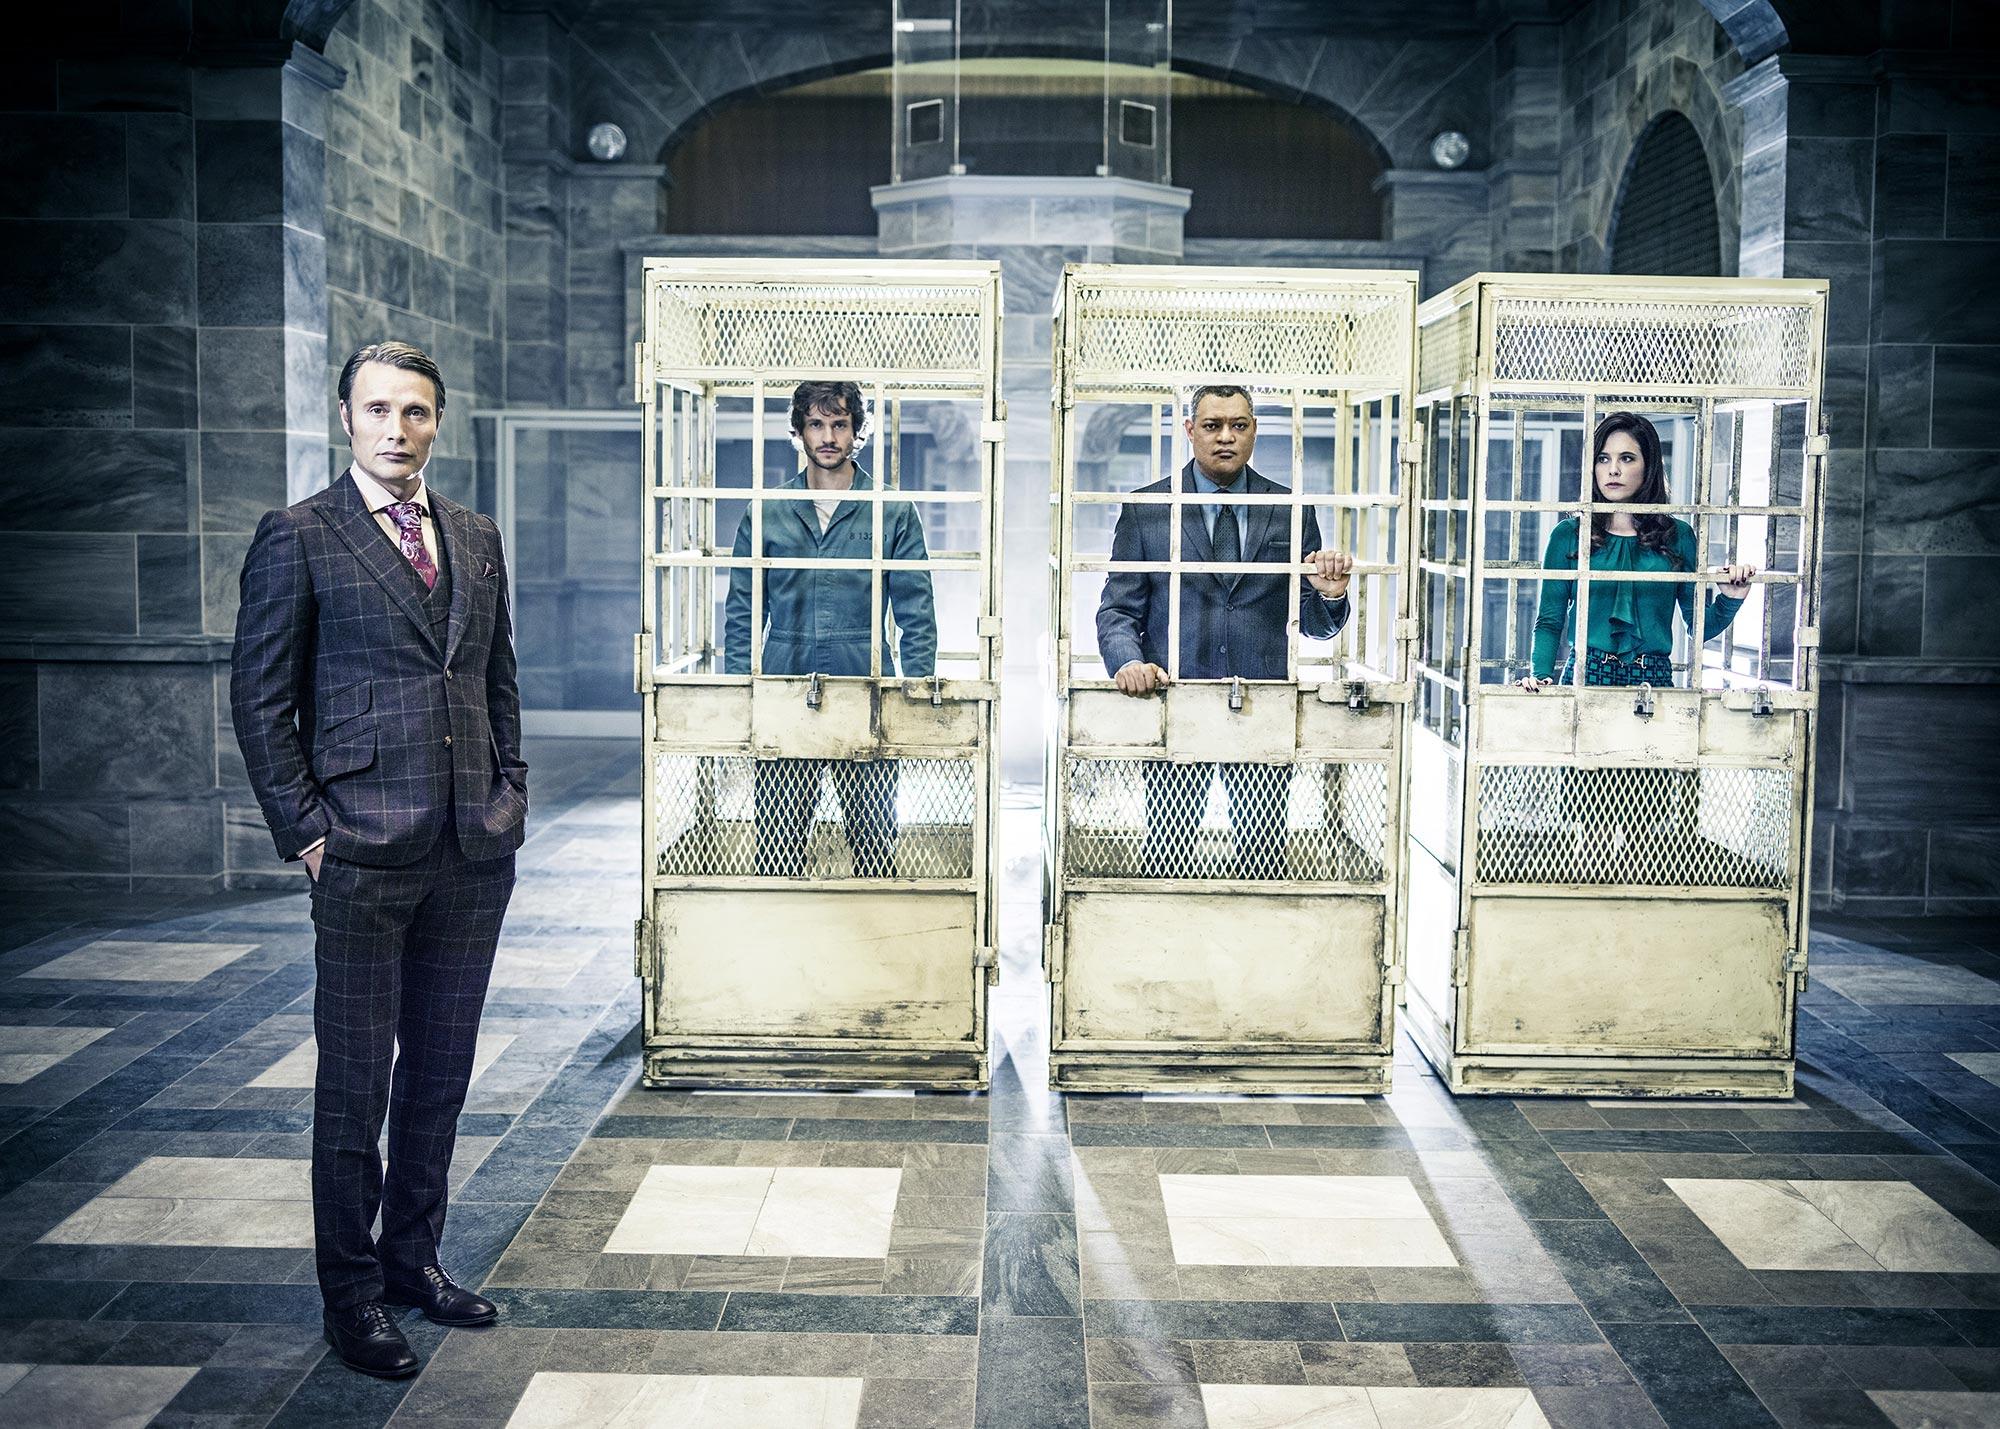 Caroline Dhavernas Hannibal Tv Series Season 2 Promo